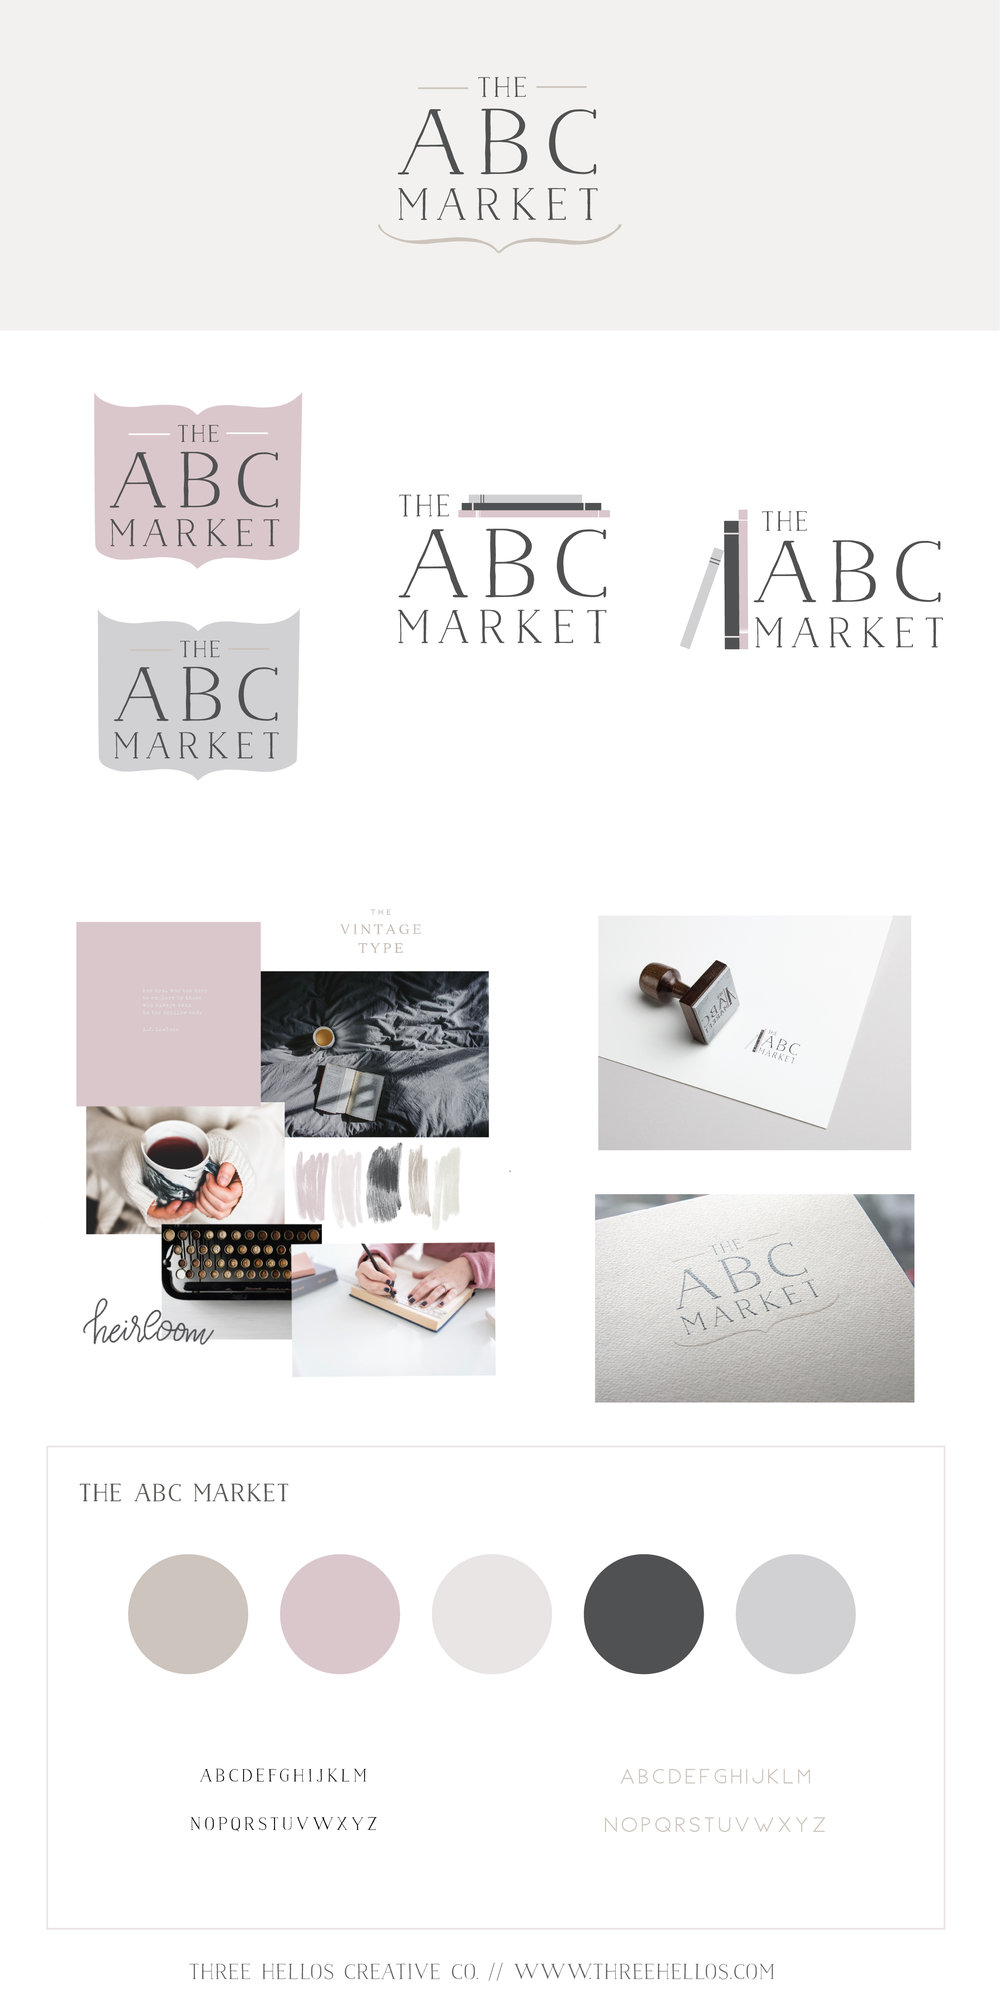 TheABCMarket_brandboard-01.jpg